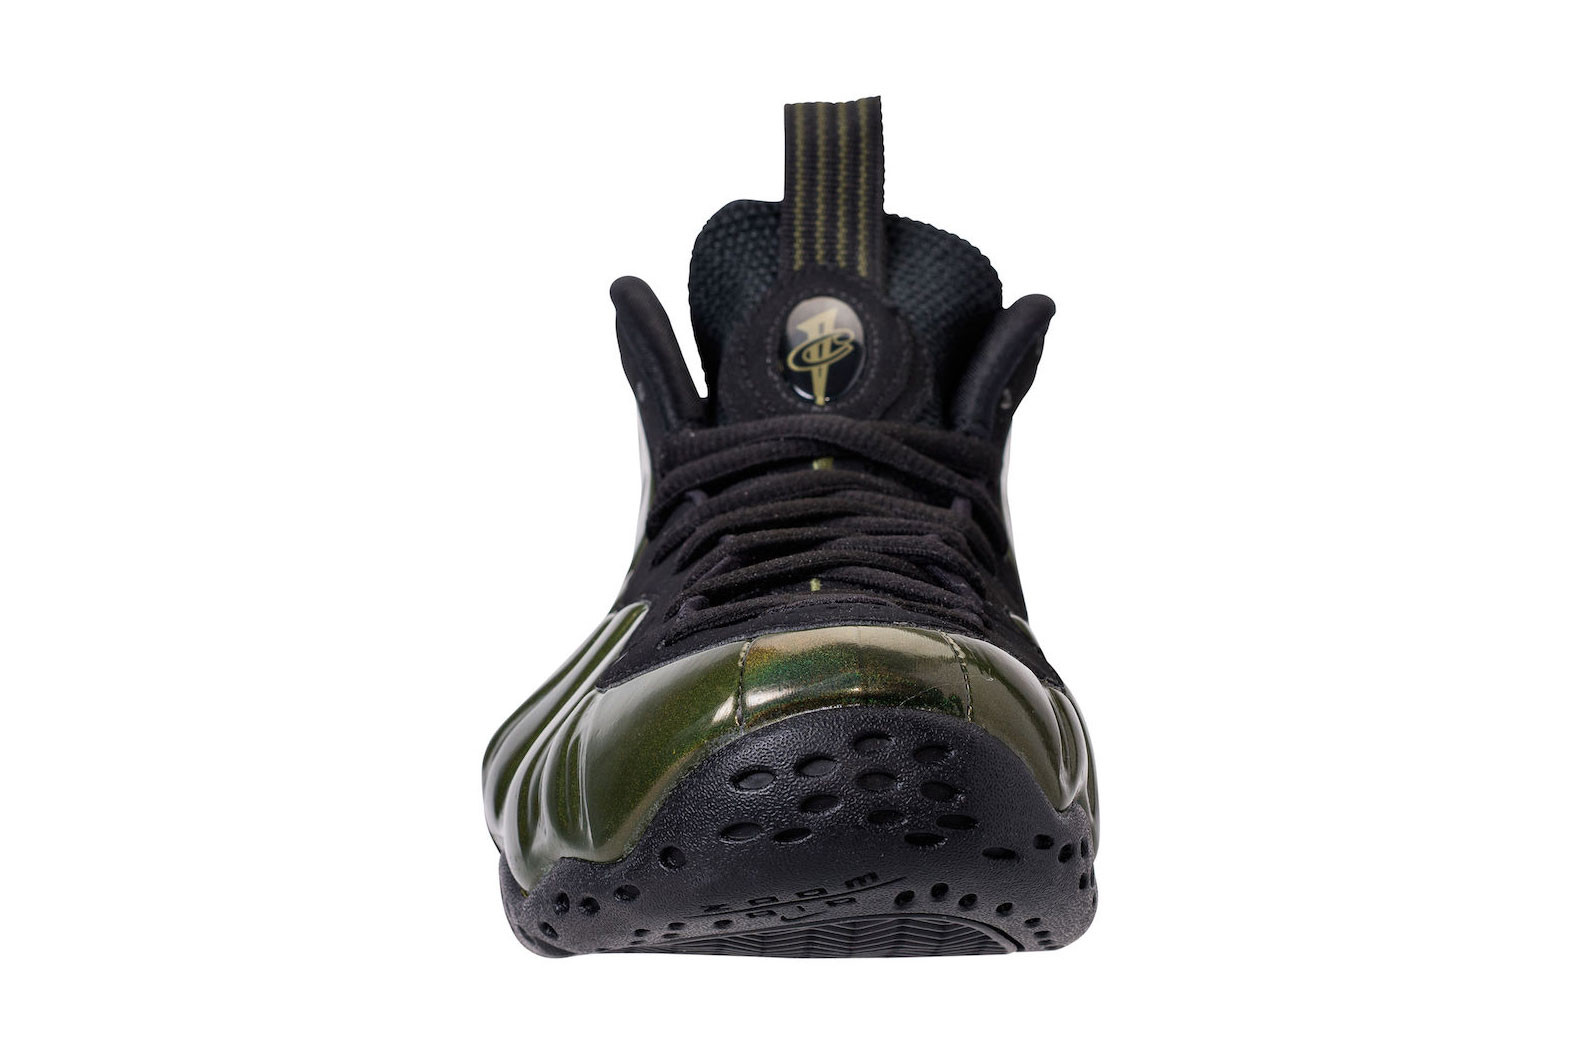 Nike Air Foamposite One Rust PinkLa Lanterne Magique